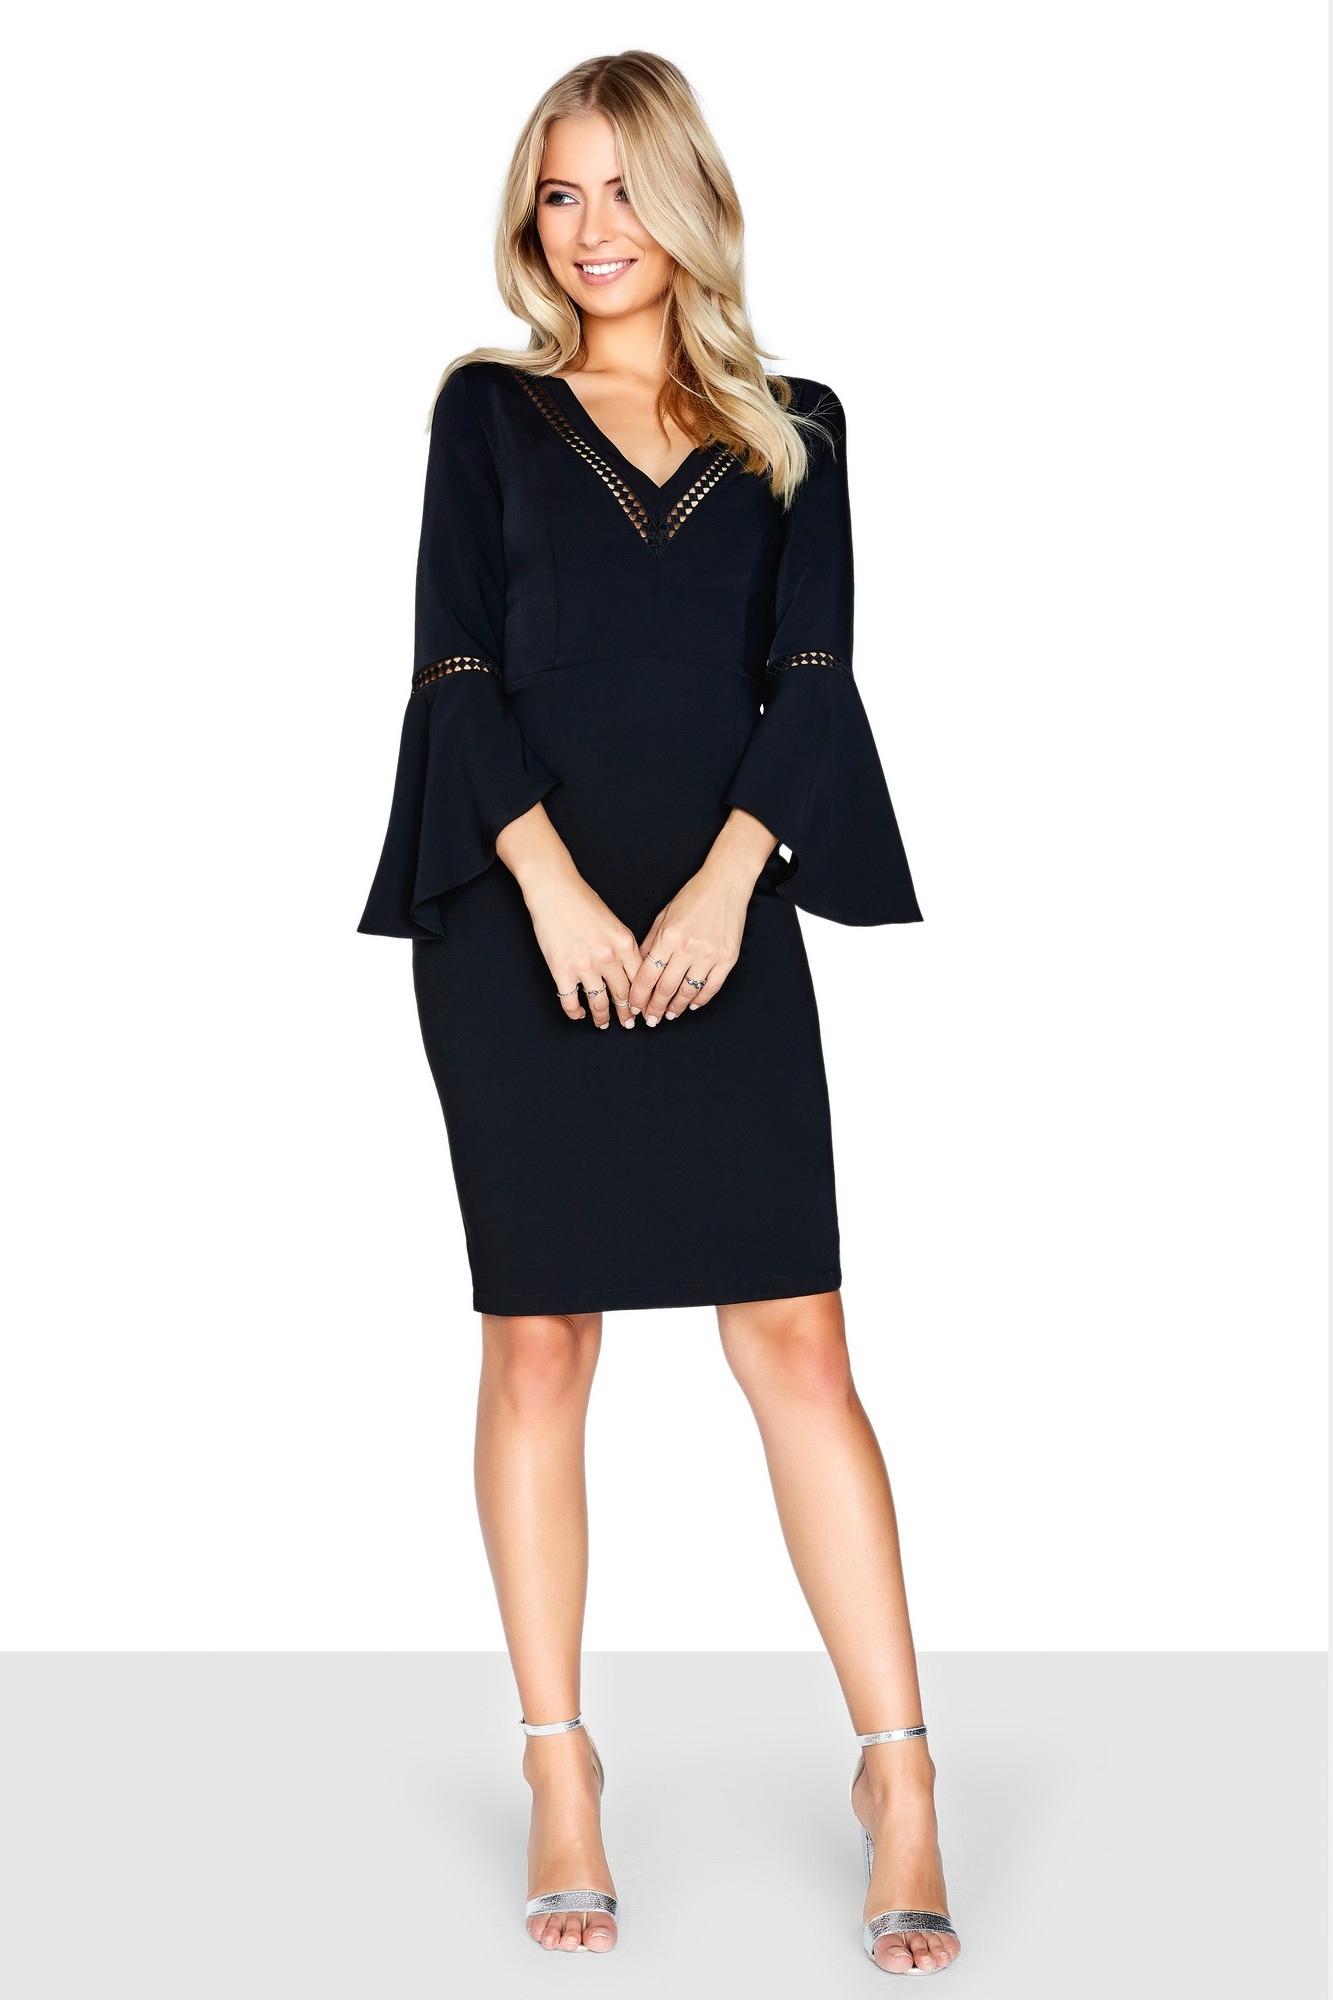 Paper Dolls Women S Fluted Long Sleeve Black Dress Available Now At Market Co Uk Order Online Get Free And Fast Black Long Sleeve Dress Black Dress Dresses [ 2000 x 1333 Pixel ]